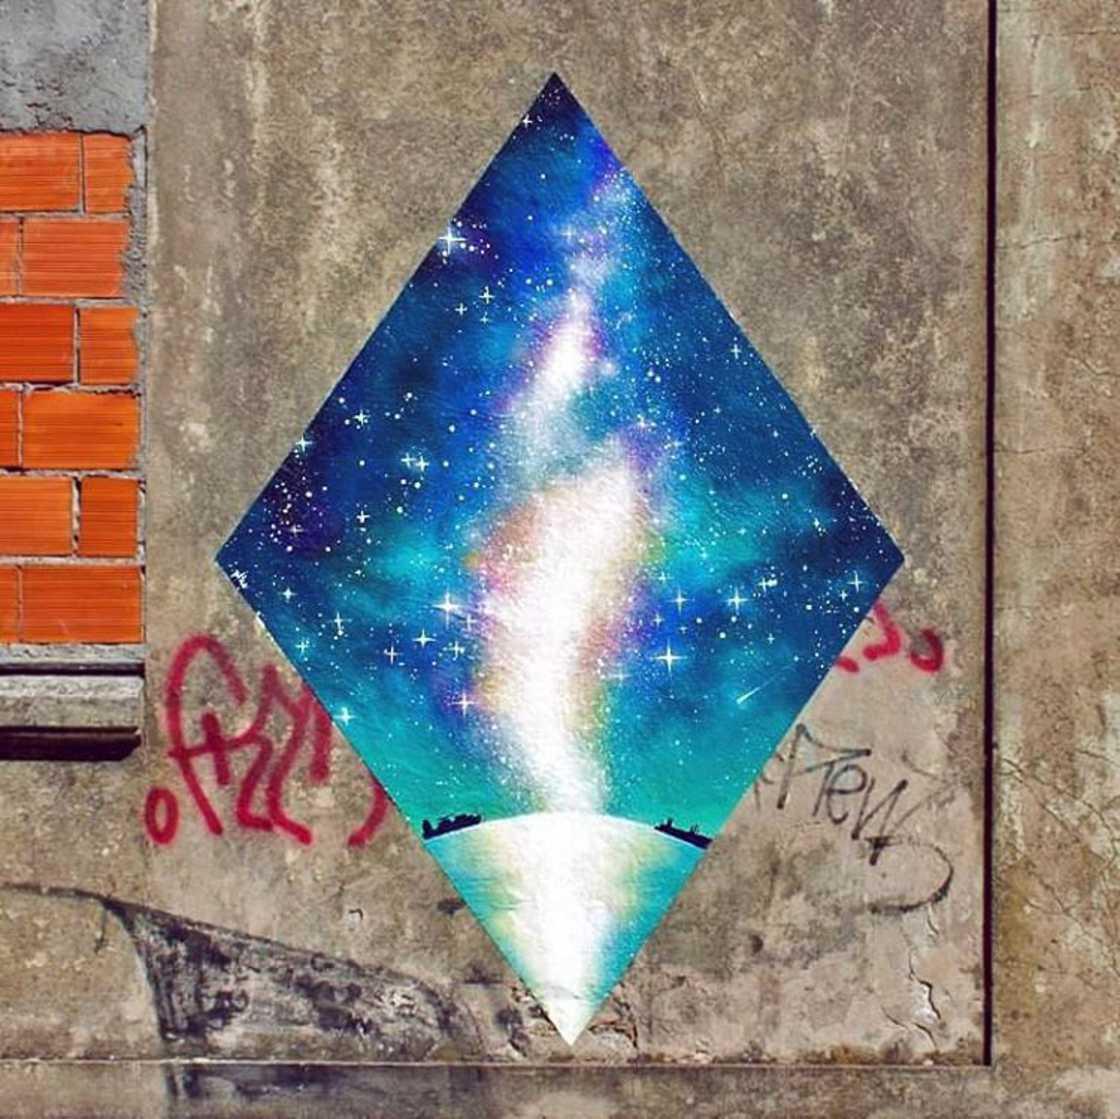 Mariana-PTKS-street-art-11